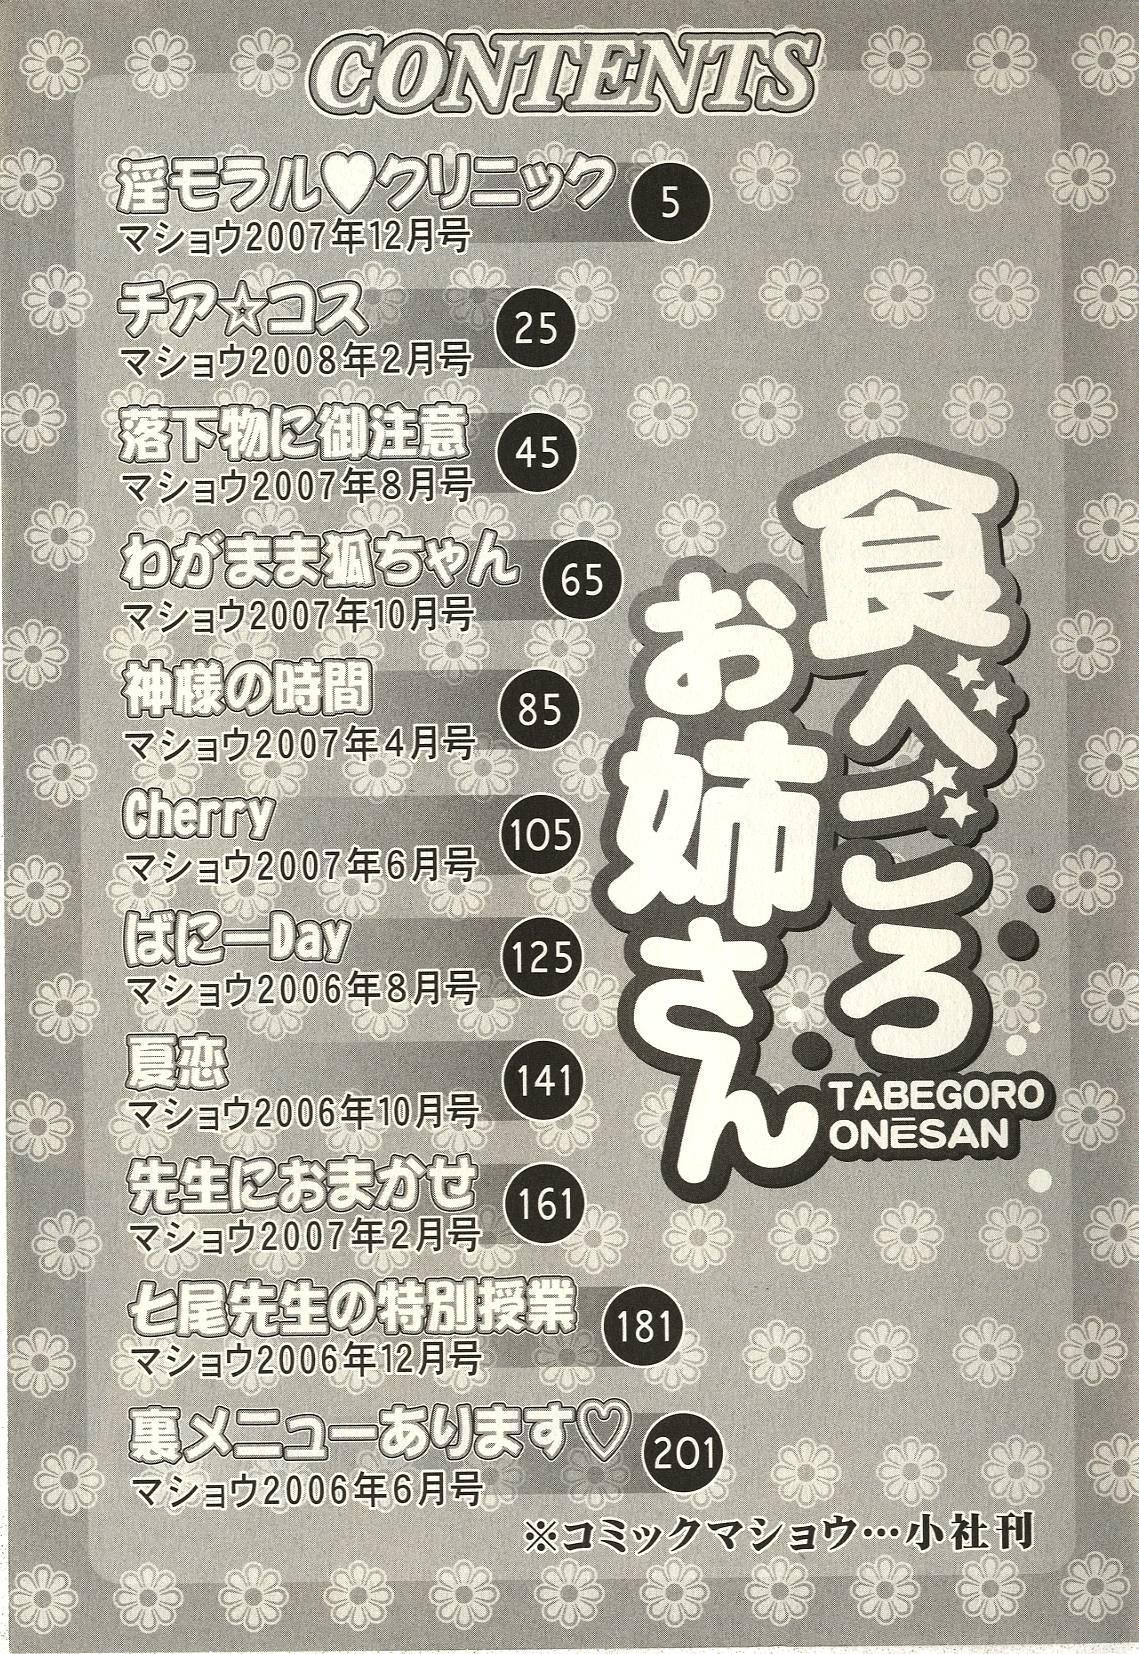 Tabegoro Onee-san 216